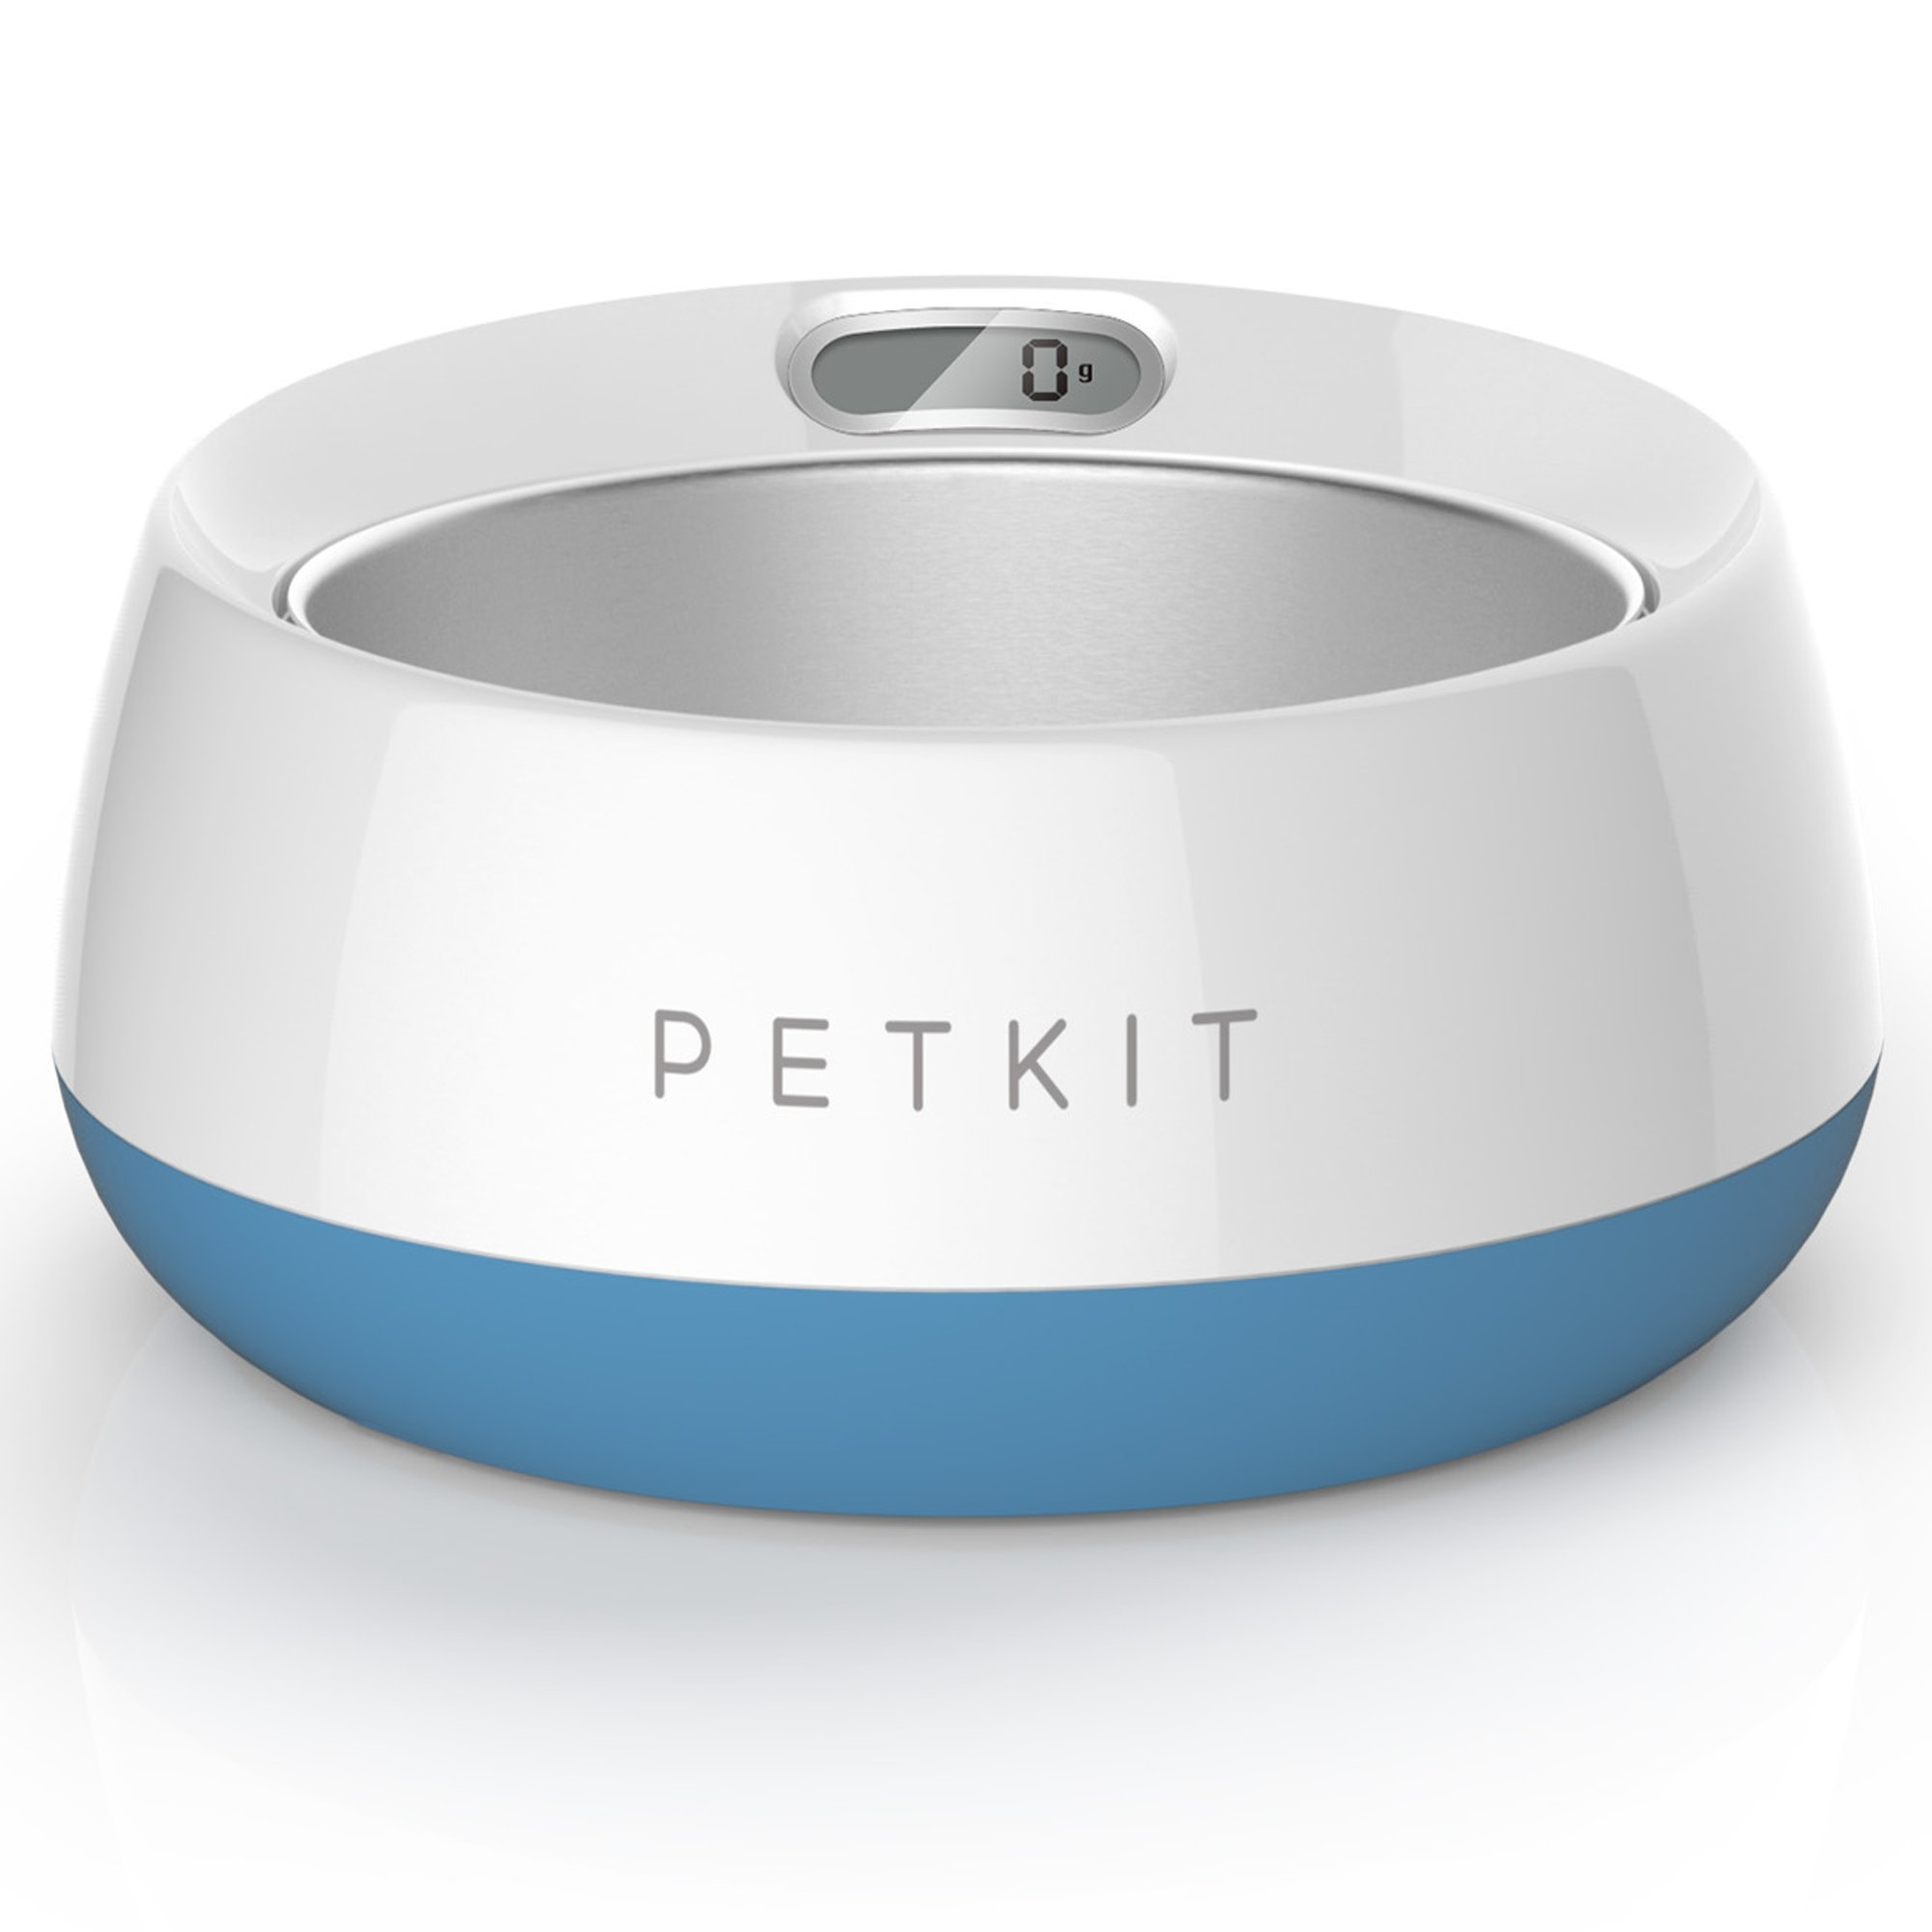 PetKit FRESH Metal Smart Digital Feeding Pet Bowl - Blue